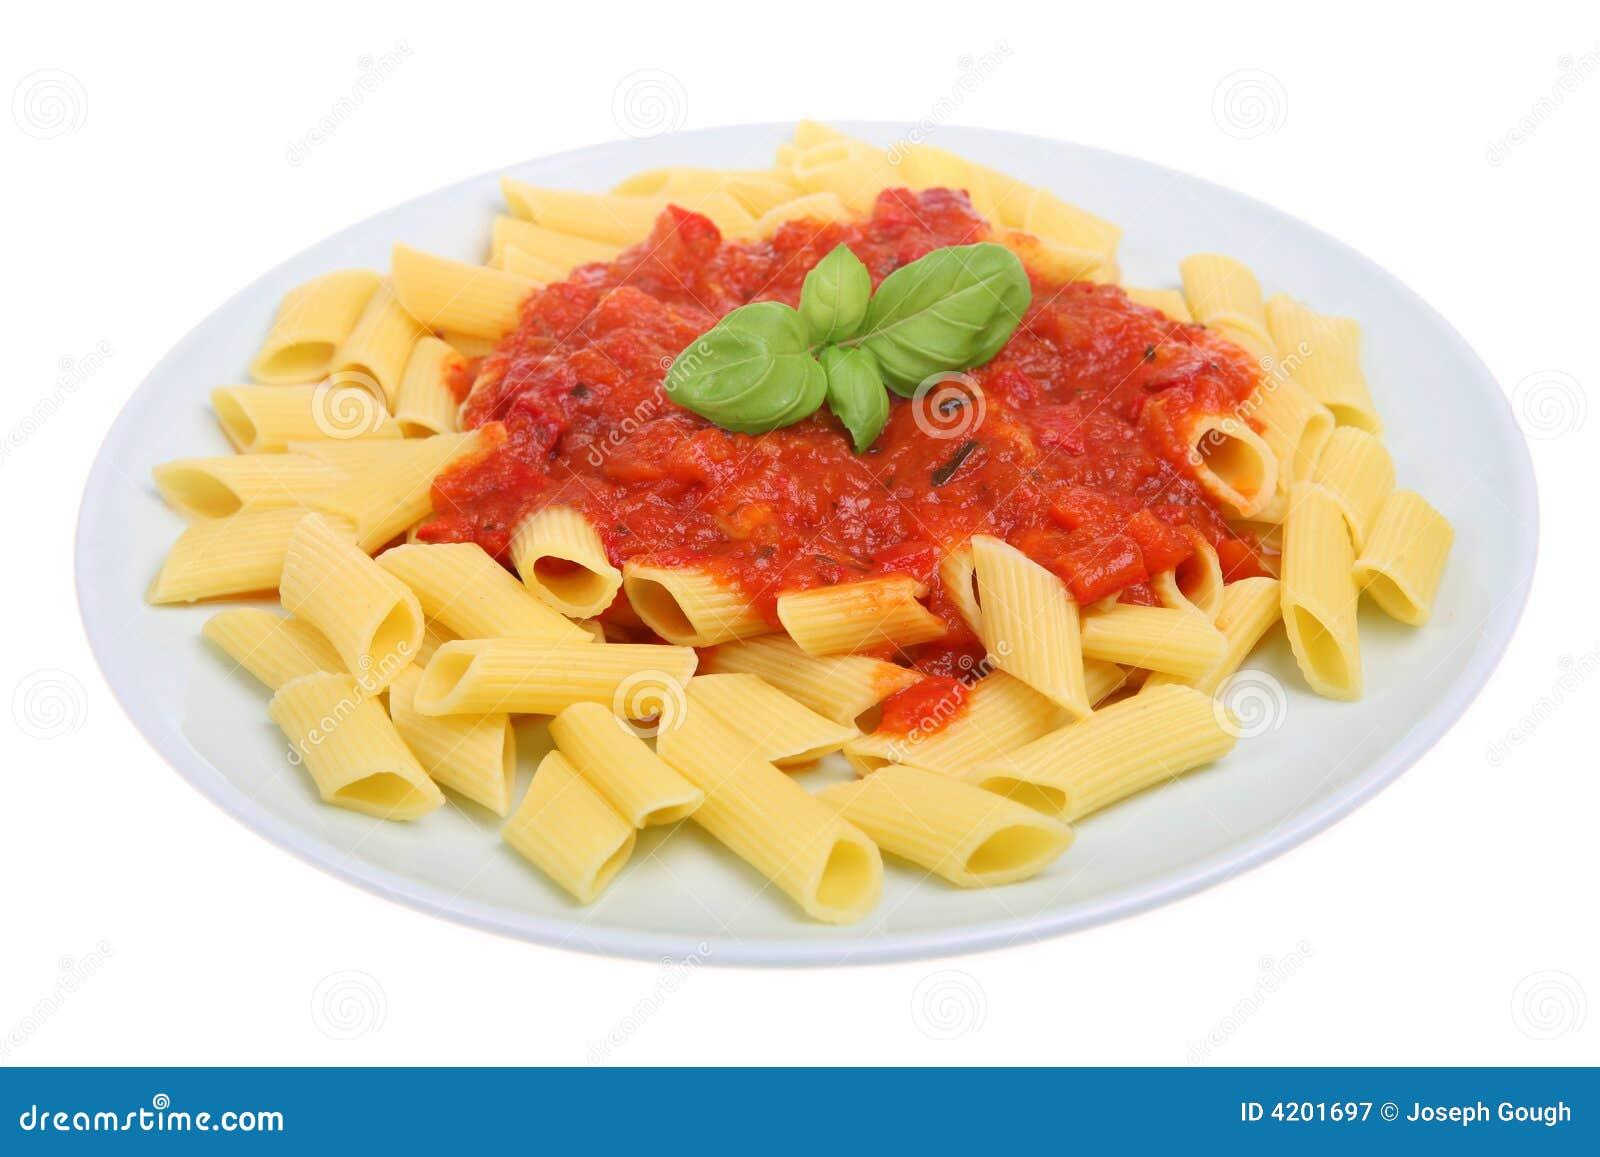 Rigatoni Pasta And Tomato Sauce Royalty Free Stock Photography - Image ...